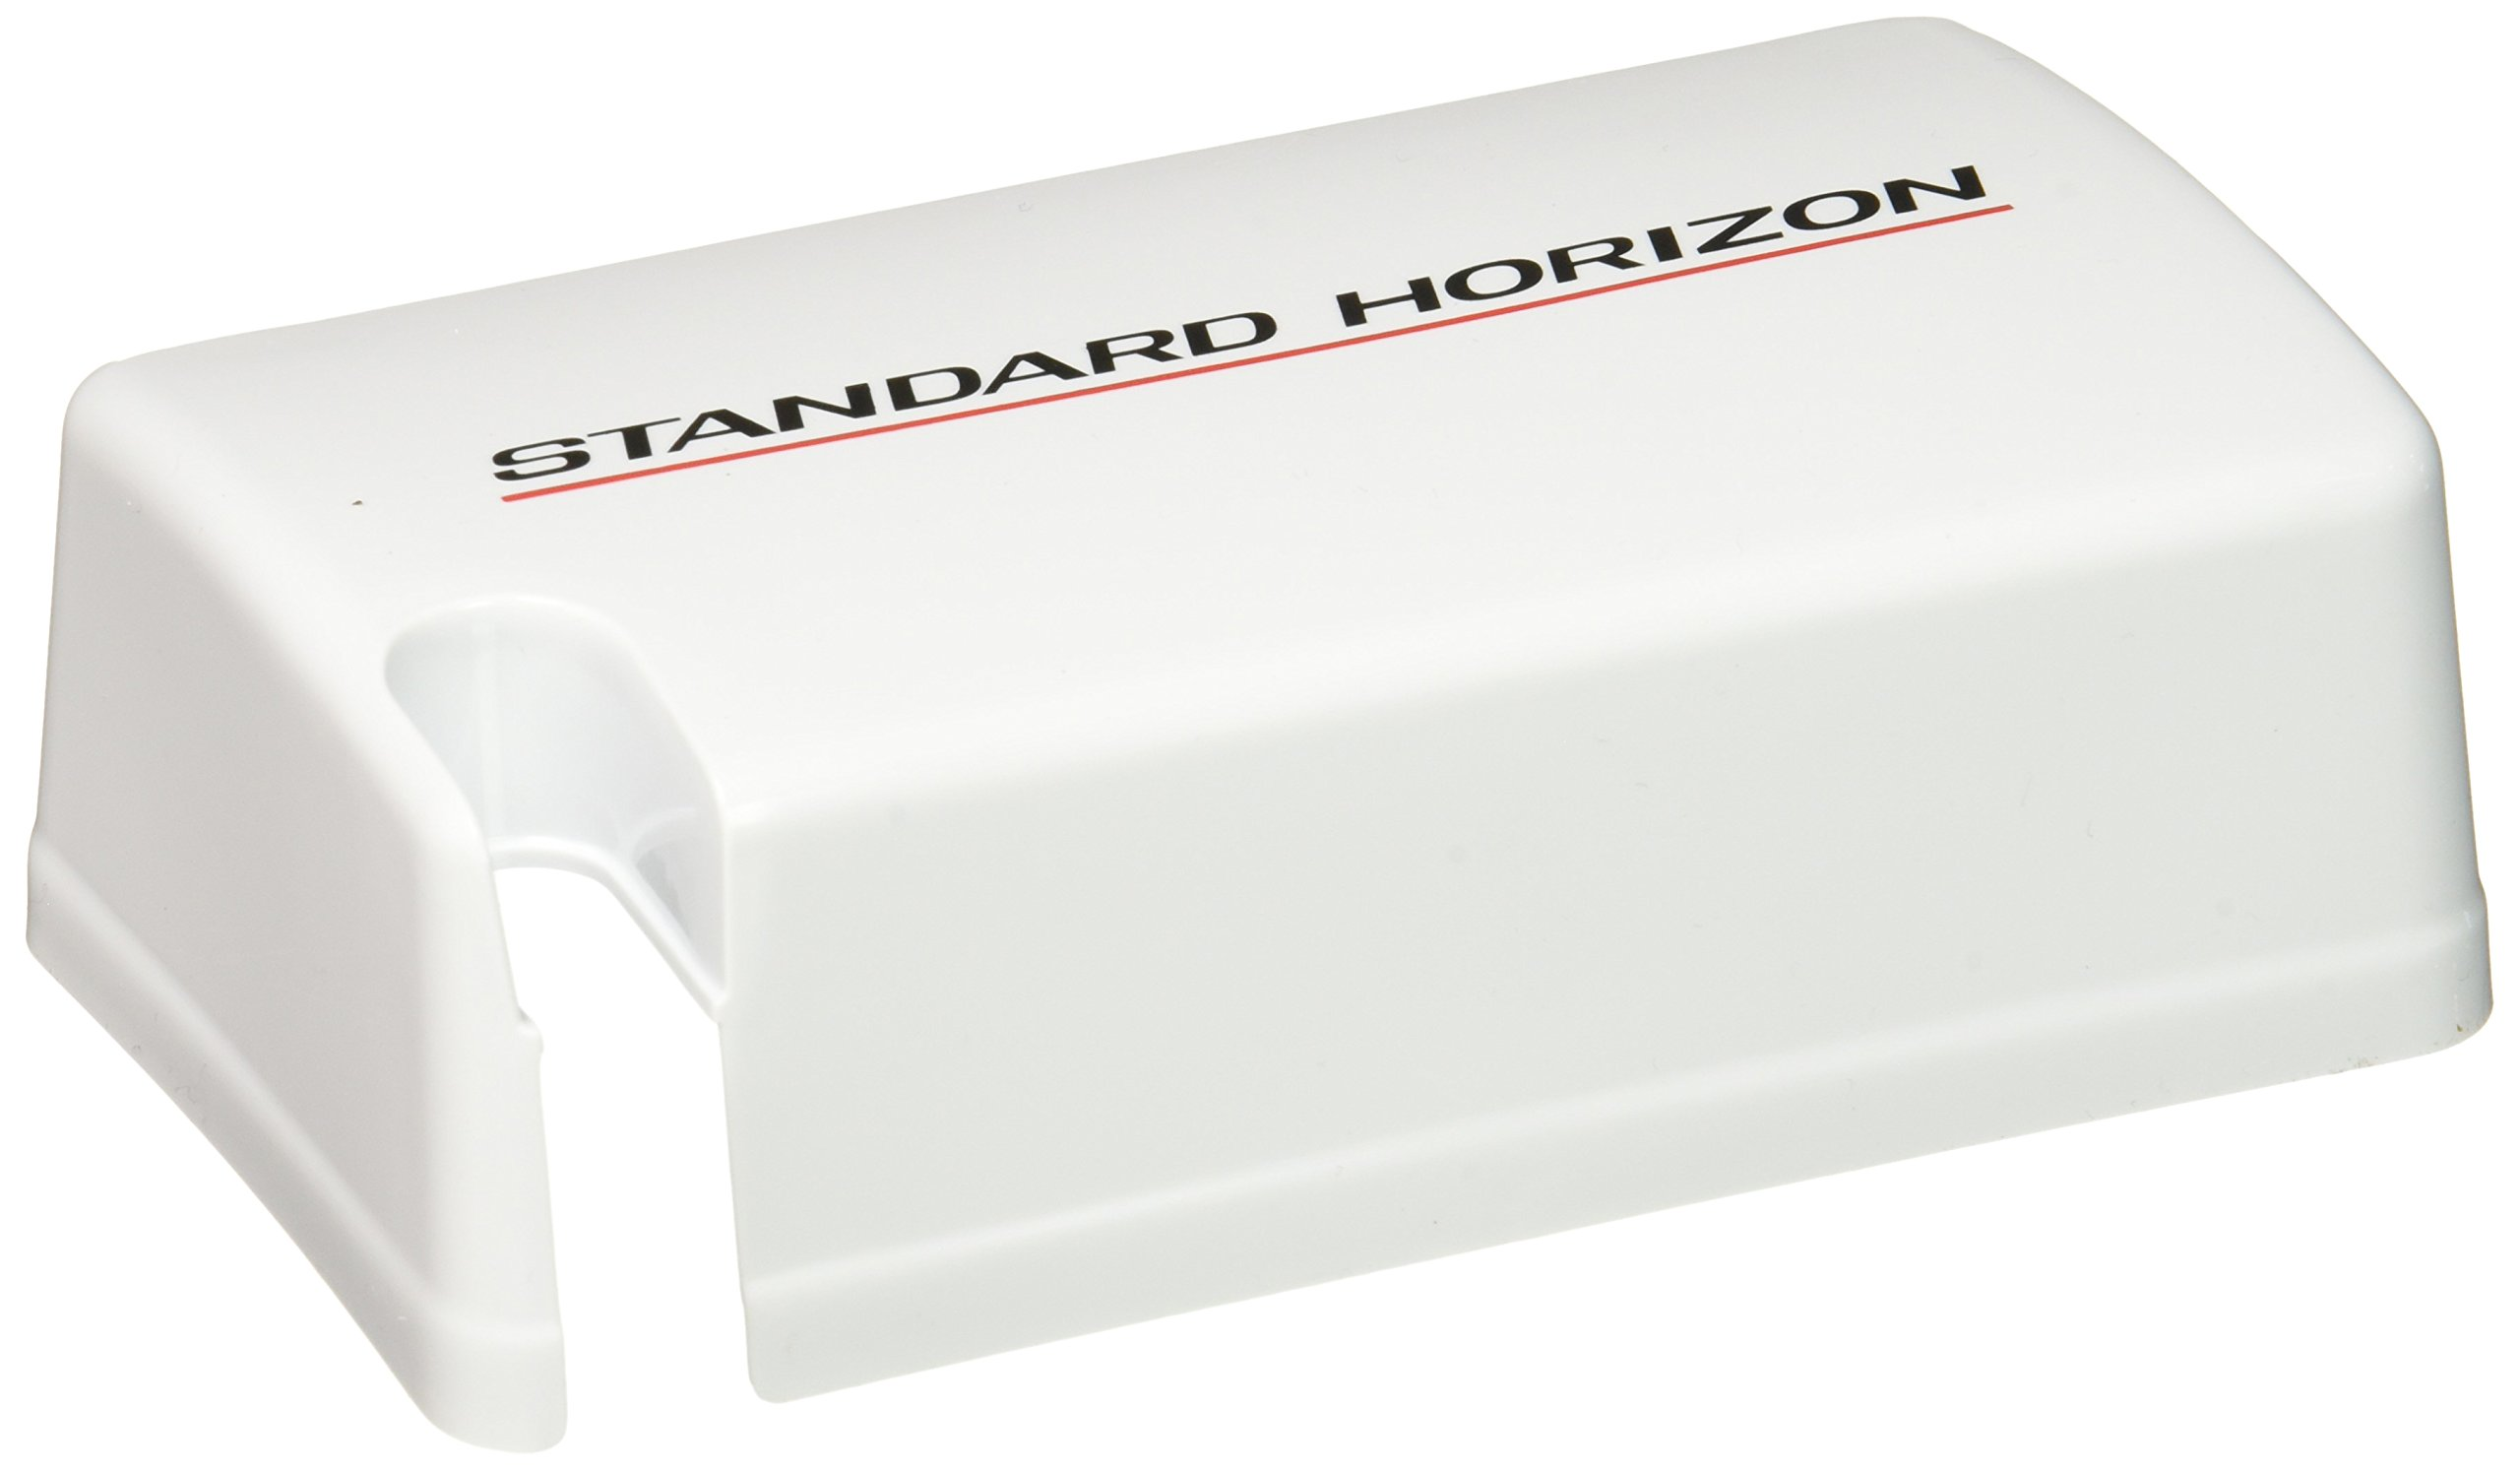 Standard Horizon HC1600 Rain/Dust cover for GX1600 Explorer Marine VHF